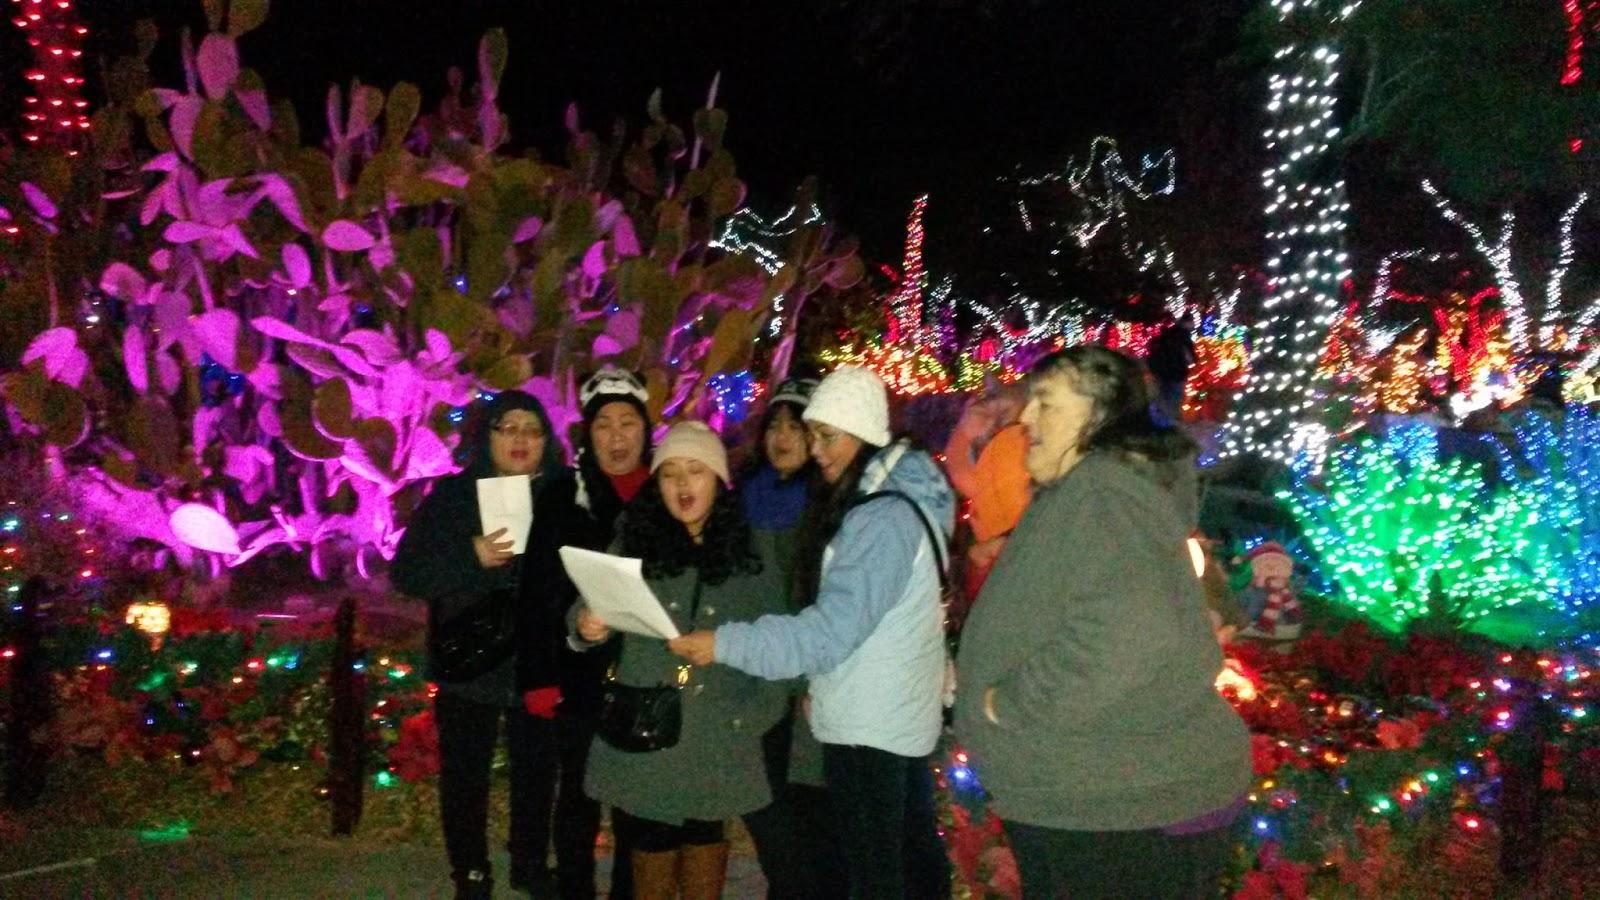 Rendla Ramblings: Christmas Carols at Ethel M Chocolate Factory